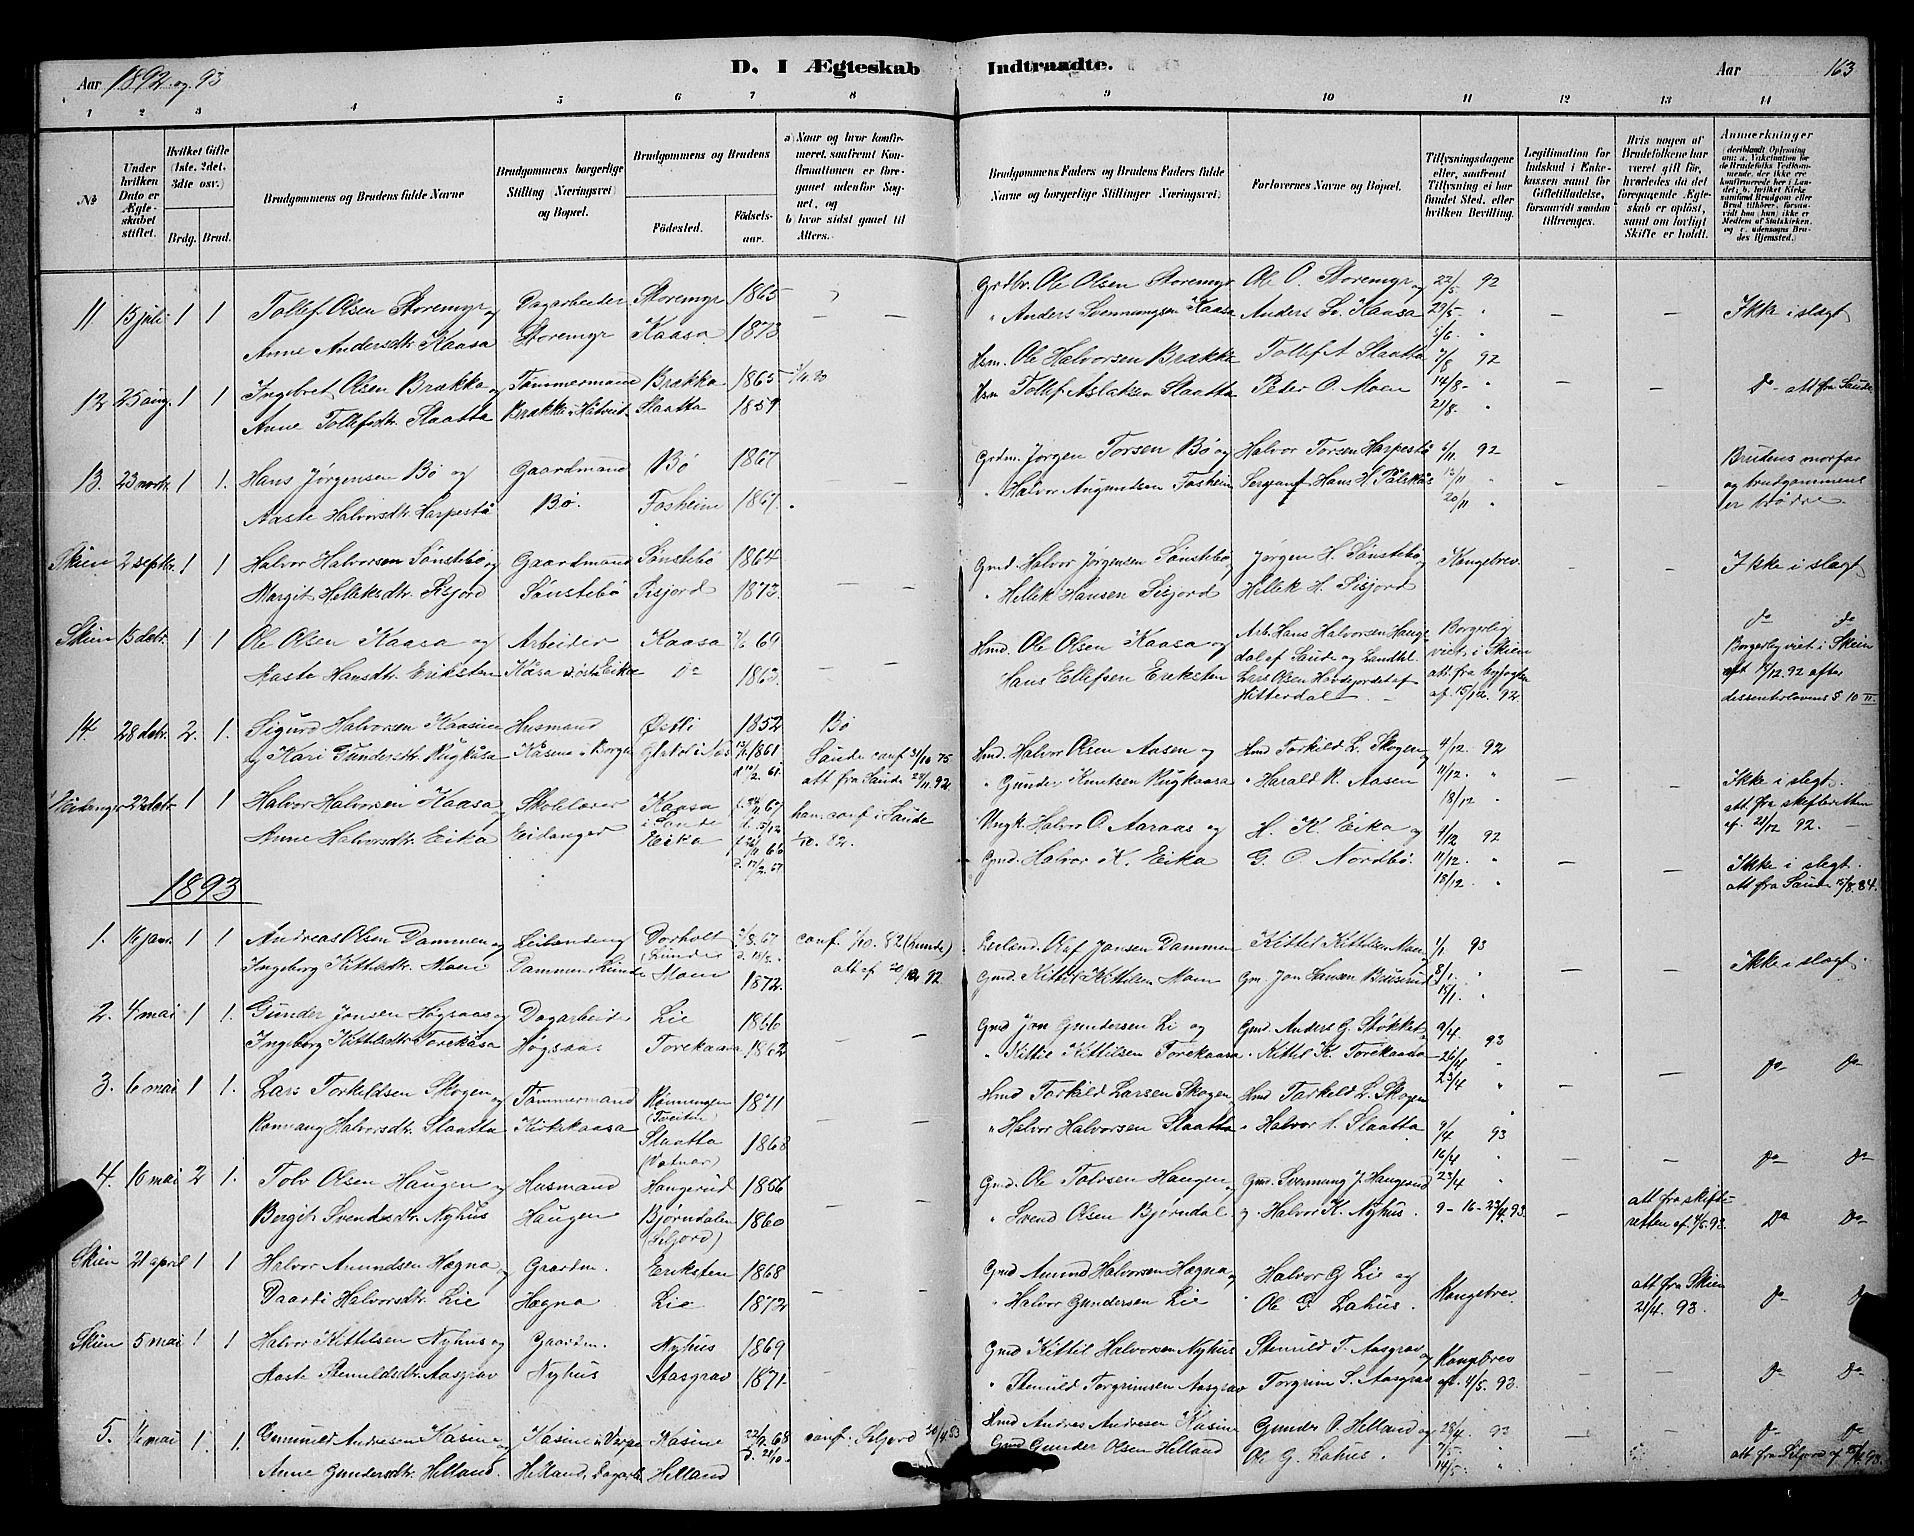 SAKO, Bø kirkebøker, G/Ga/L0005: Klokkerbok nr. 5, 1883-1897, s. 163